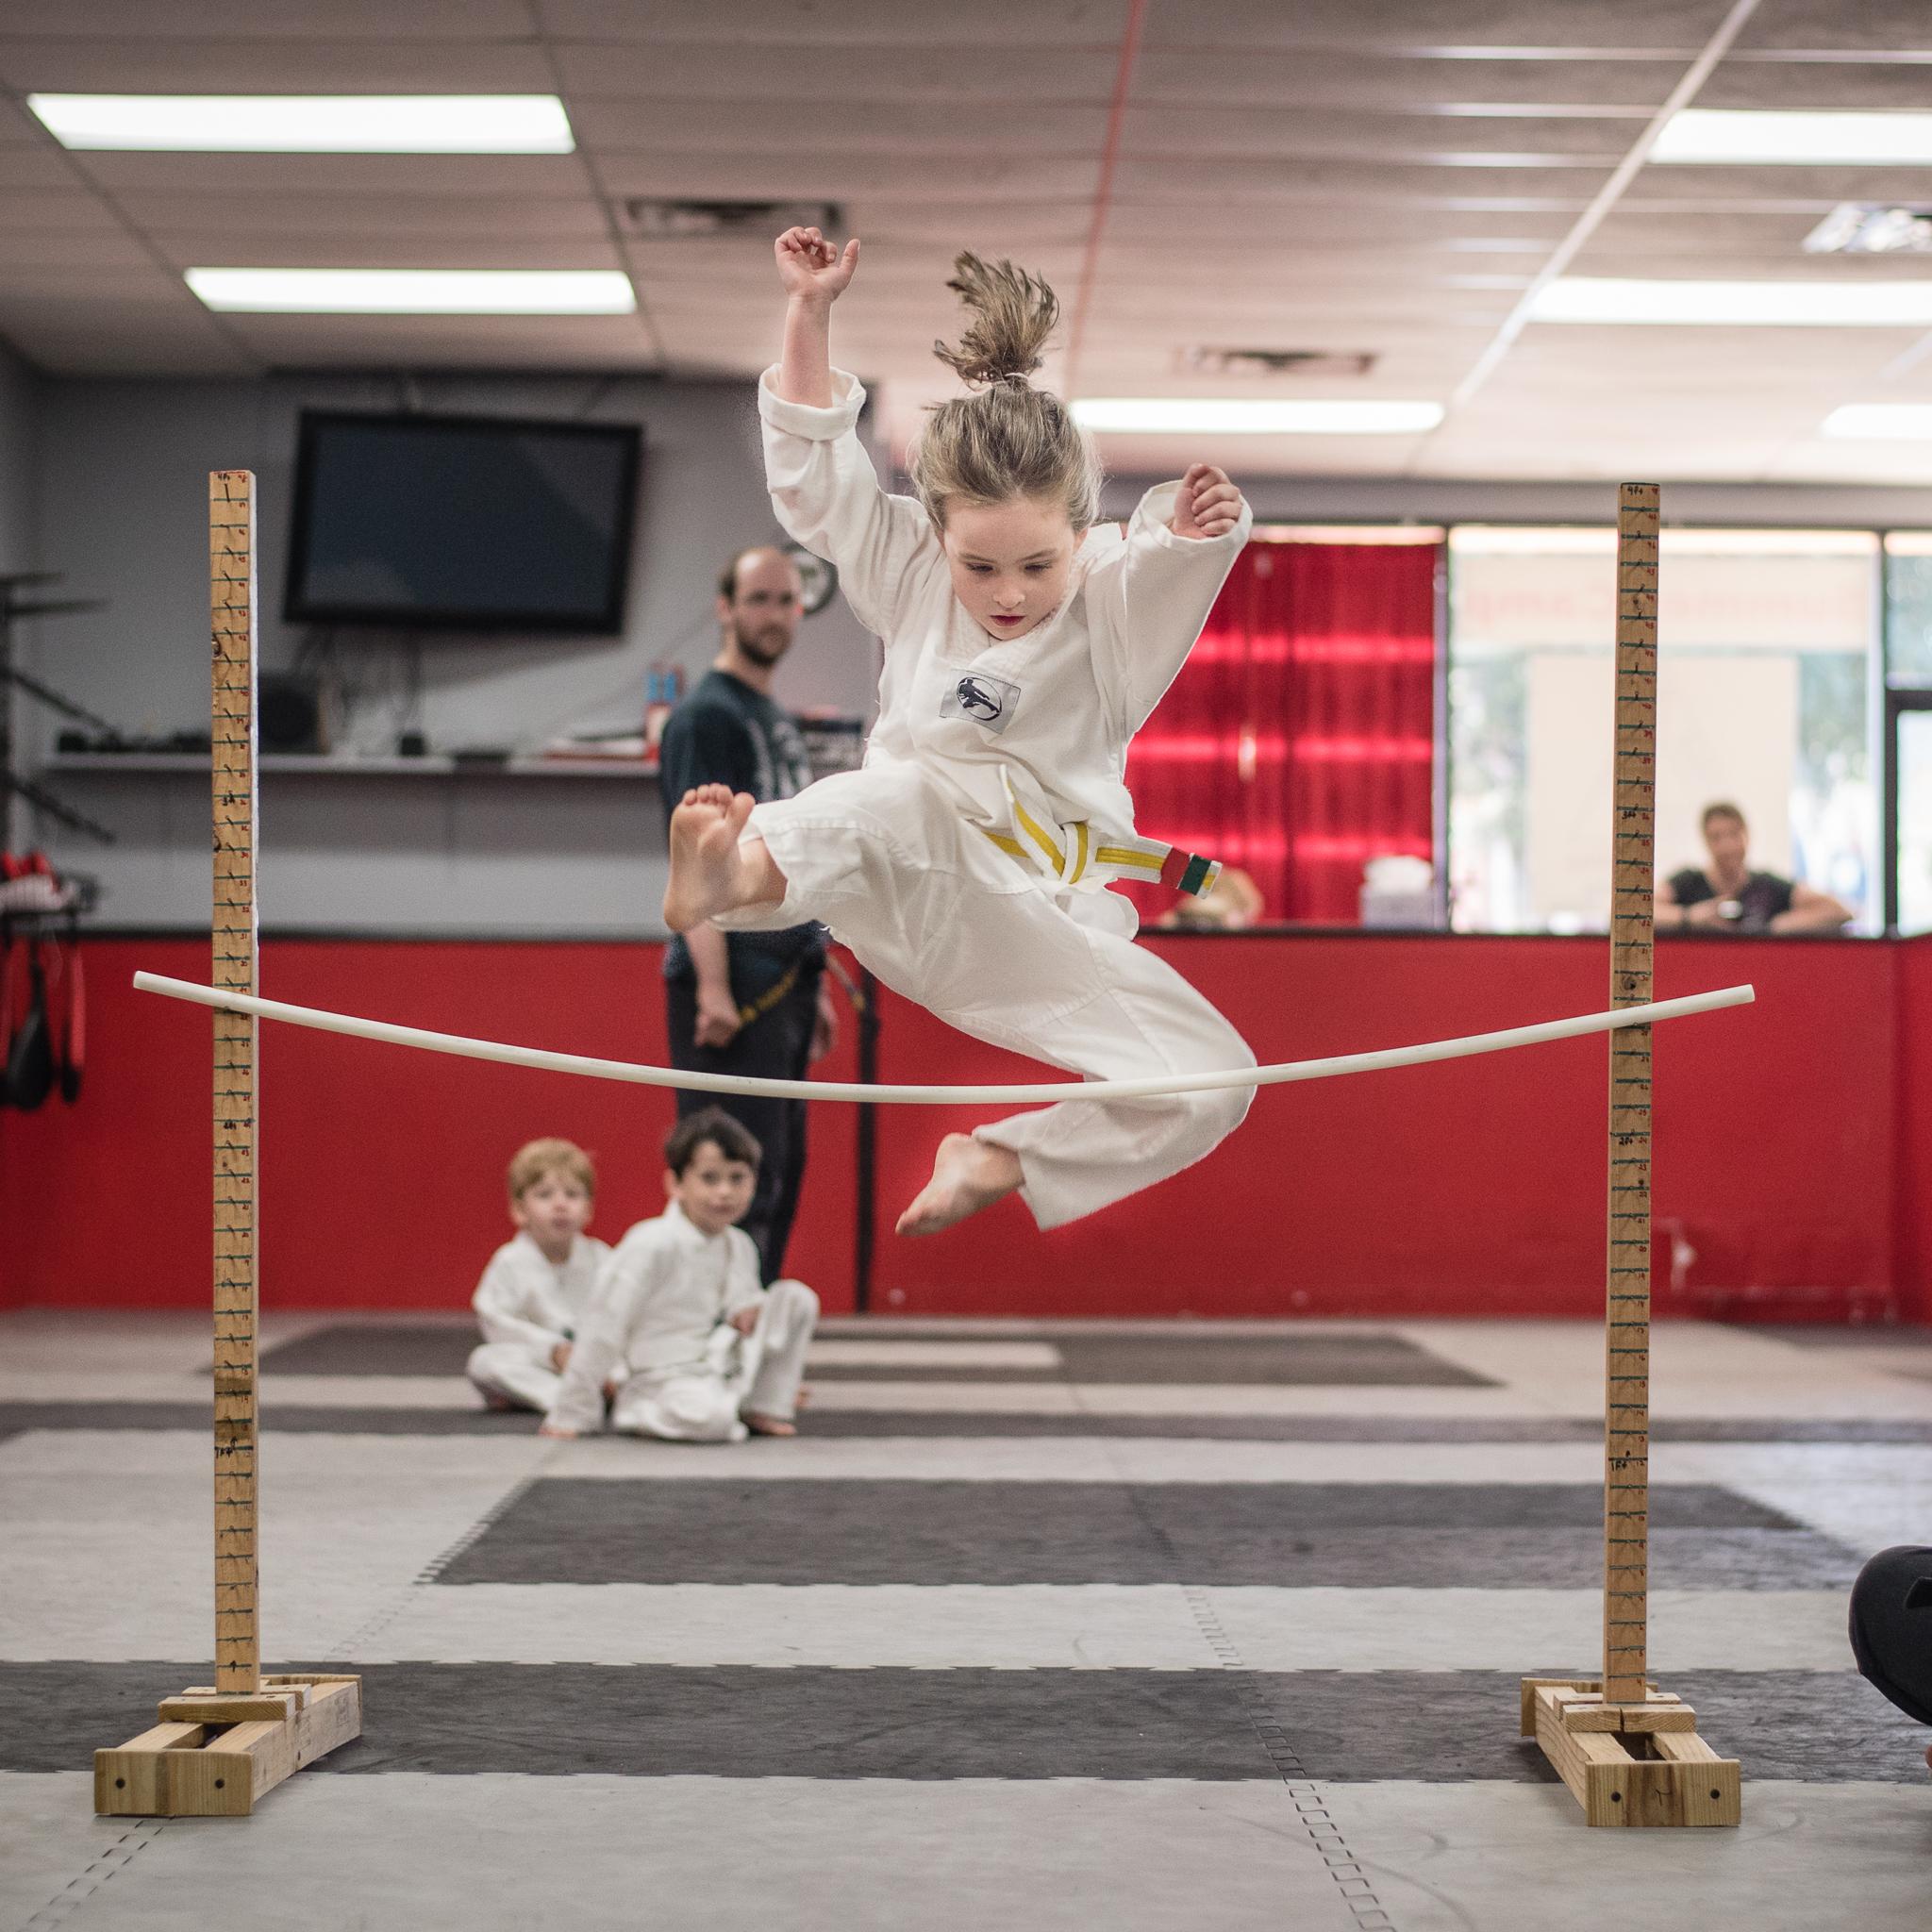 Austin and Round Rock Commercial Photography - Emily Ingalls Photography - Sports and Fitness Photography - Martial Arts Taekwondo Kajukenbo Photography-5.jpg